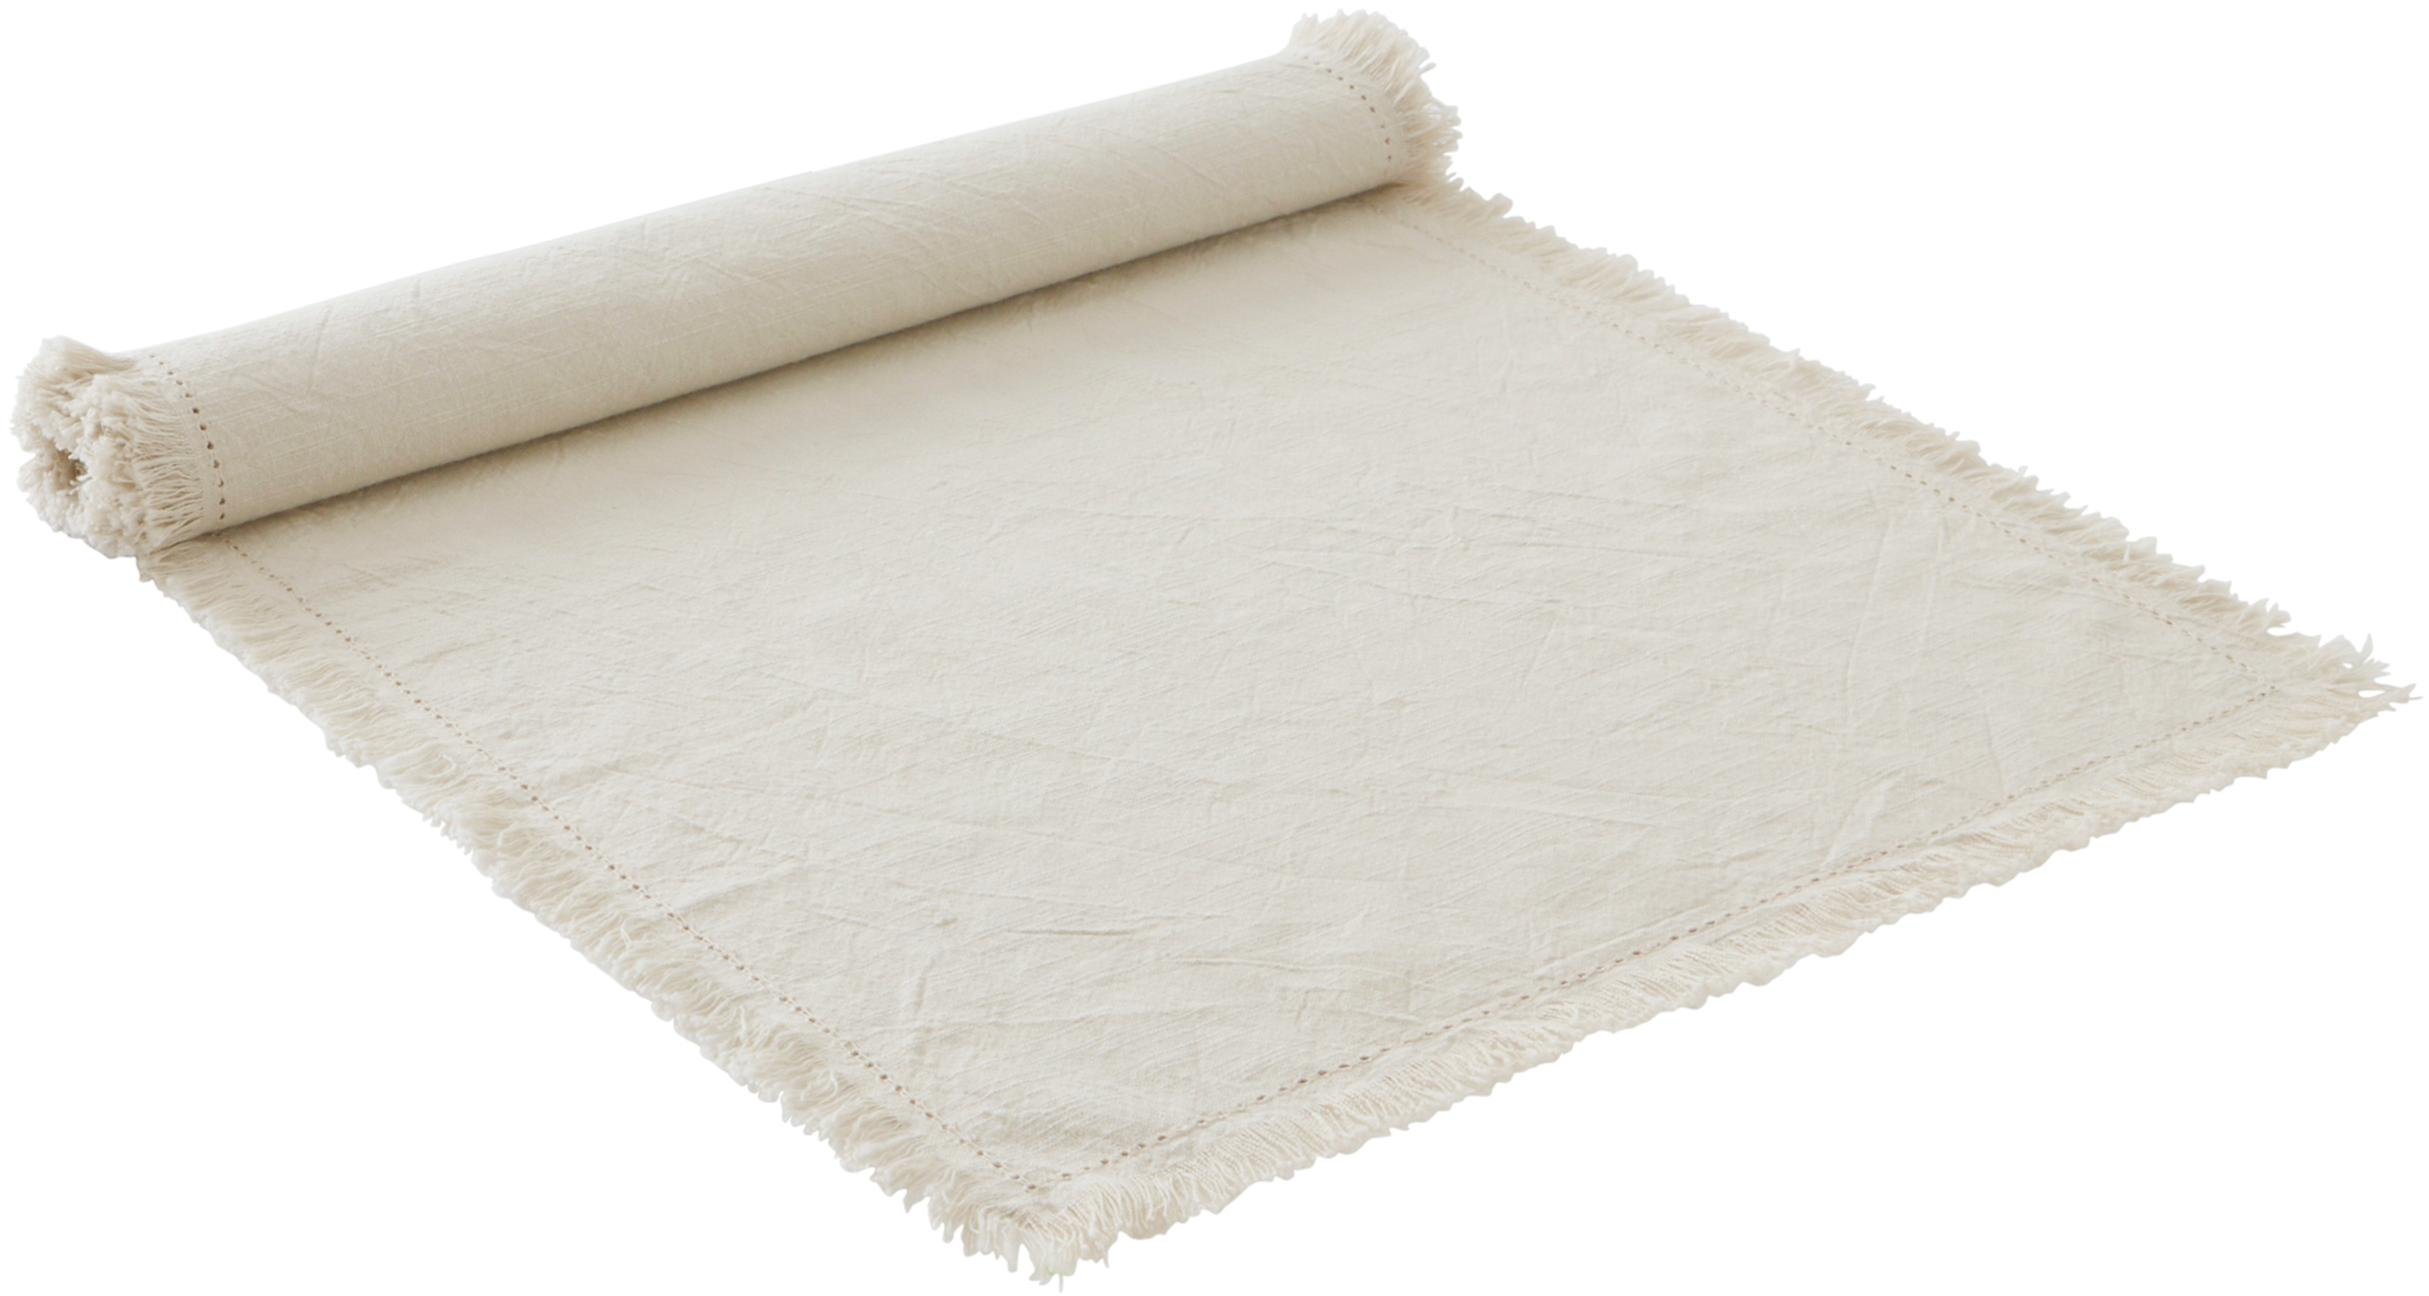 Bieżnik Hilma, 100% bawełna, Beżowy, D 40 x S 140 cm